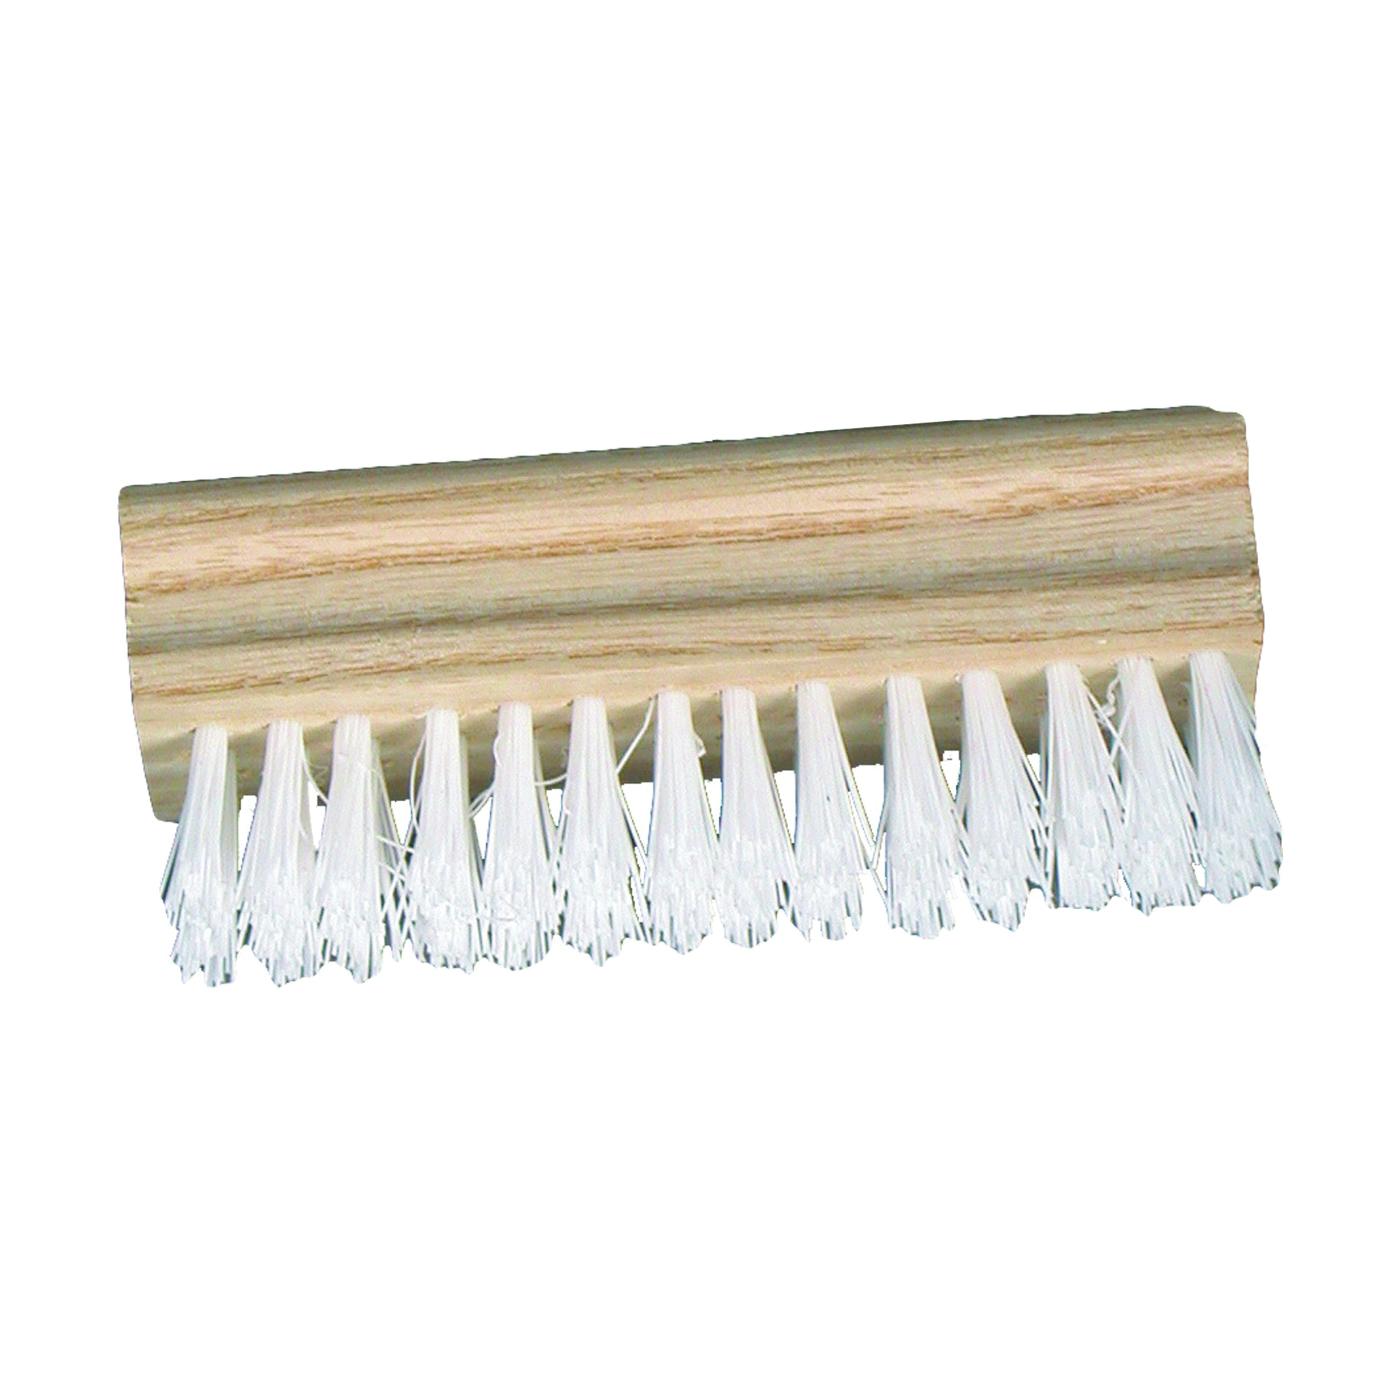 Picture of BIRDWELL 251 Nail Brush, 7/8 in L Trim, 4 in W Brush